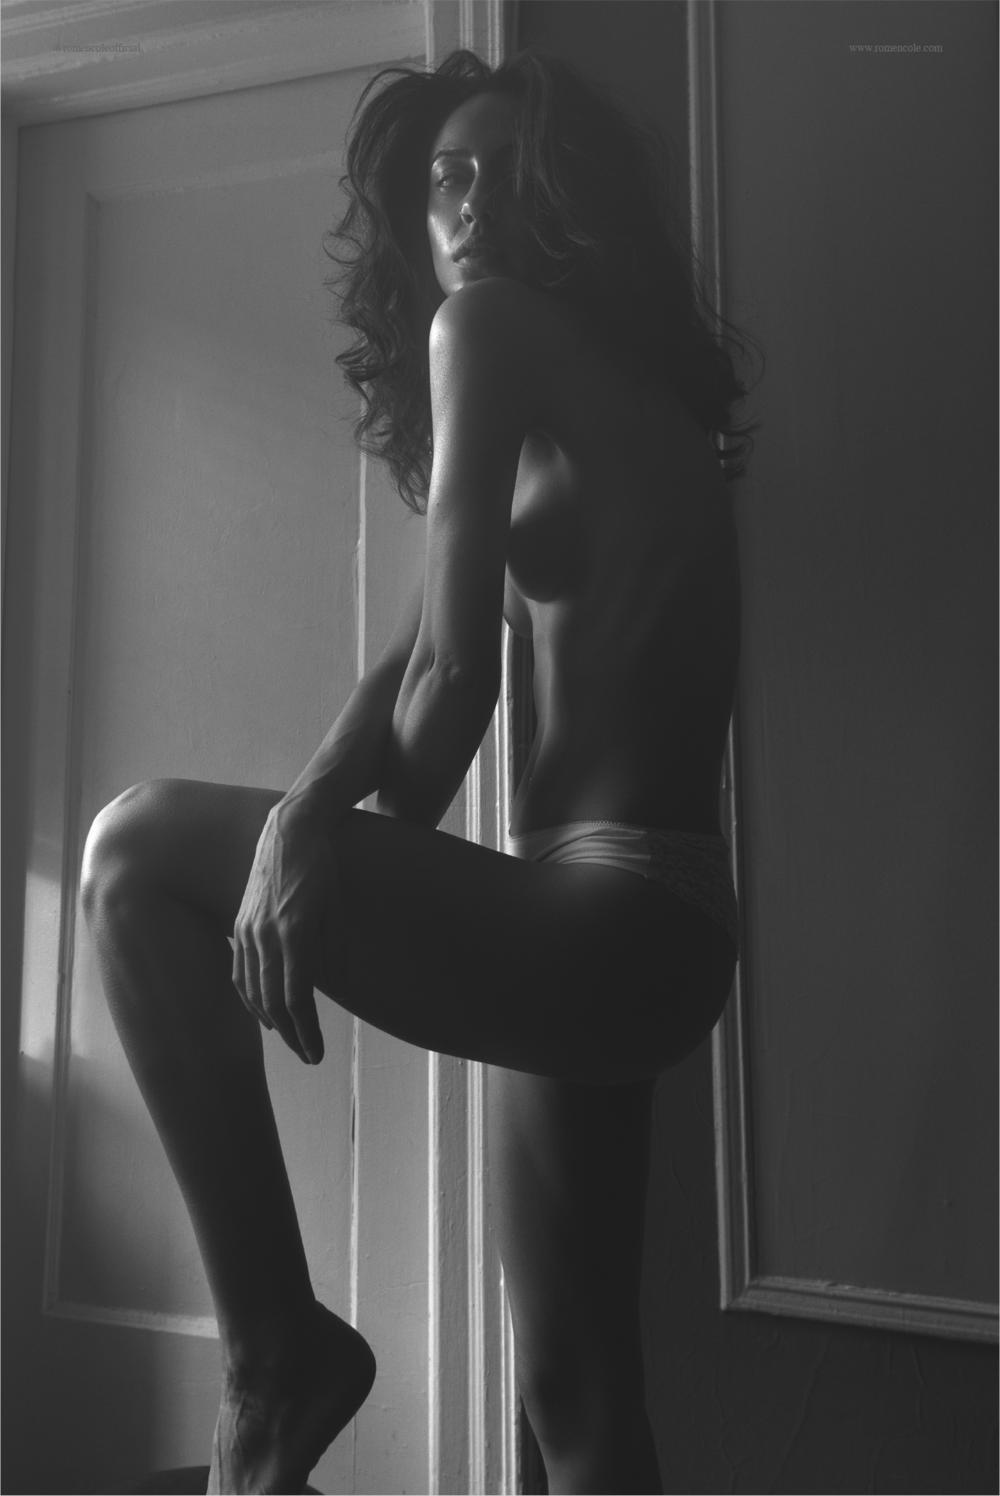 """Away"" webitorial; model - Nina B., published April 2017"